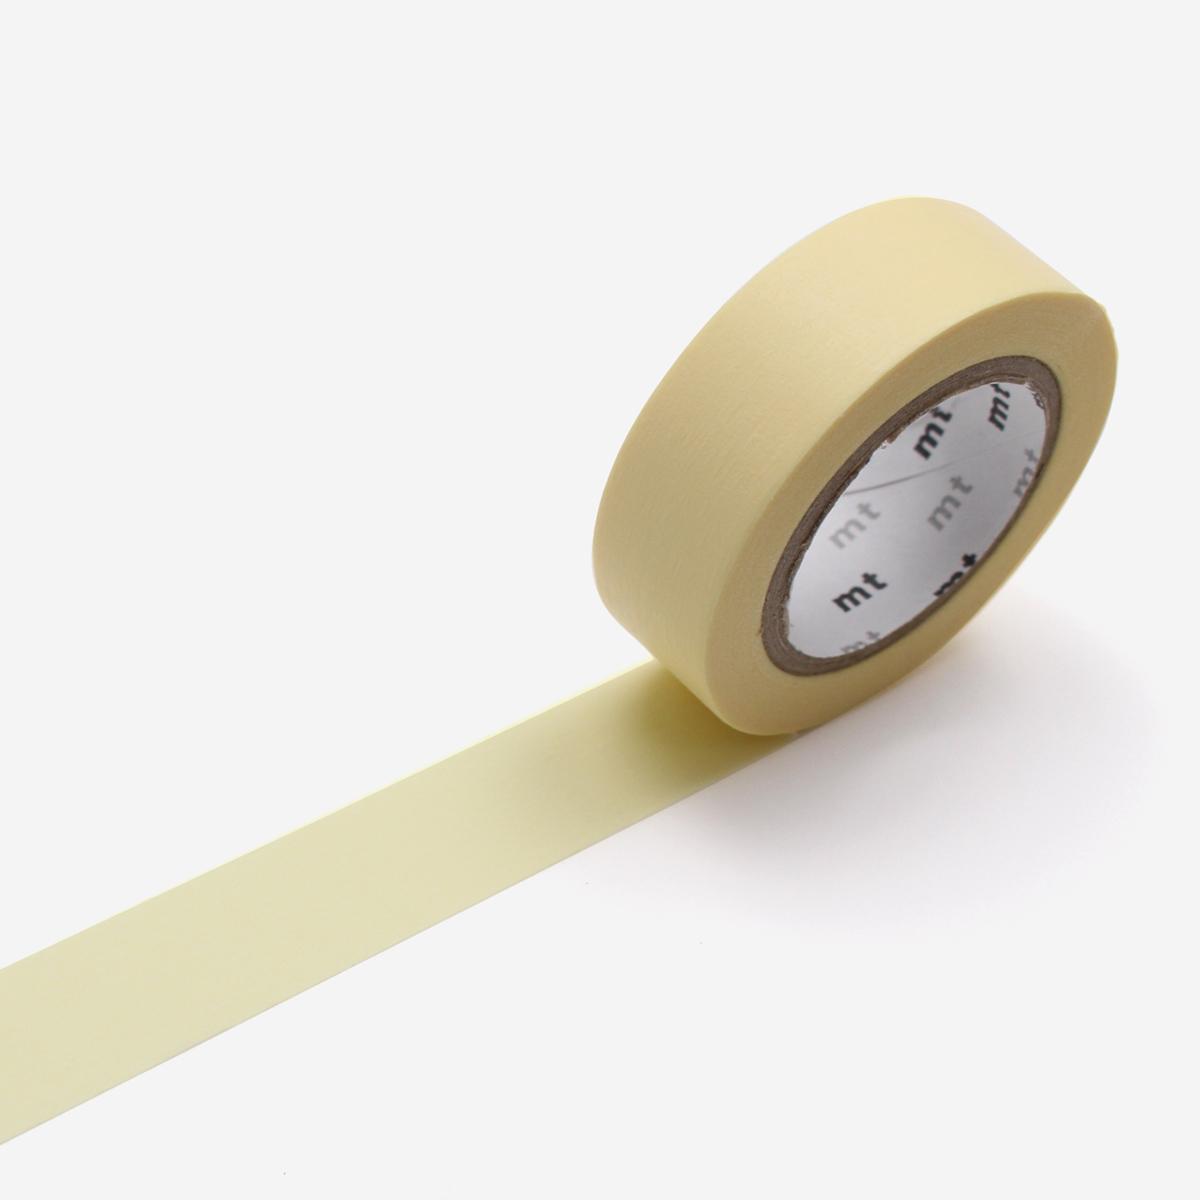 rikiki grafik produkt pastel yellow masking tape. Black Bedroom Furniture Sets. Home Design Ideas